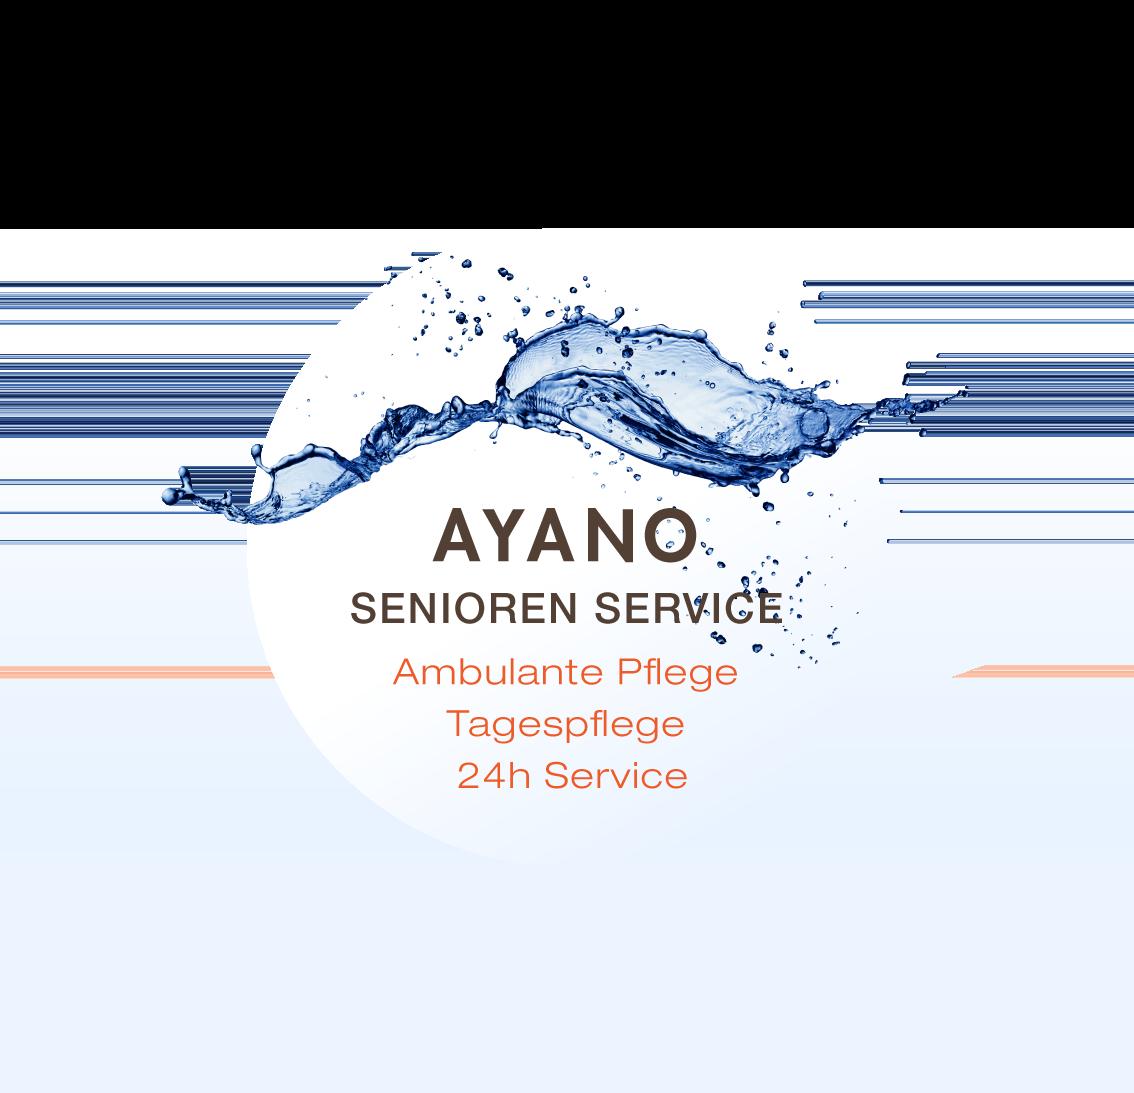 Ayano Senioren Service - Ambulante Pflege, Tagespflege, 24h Service